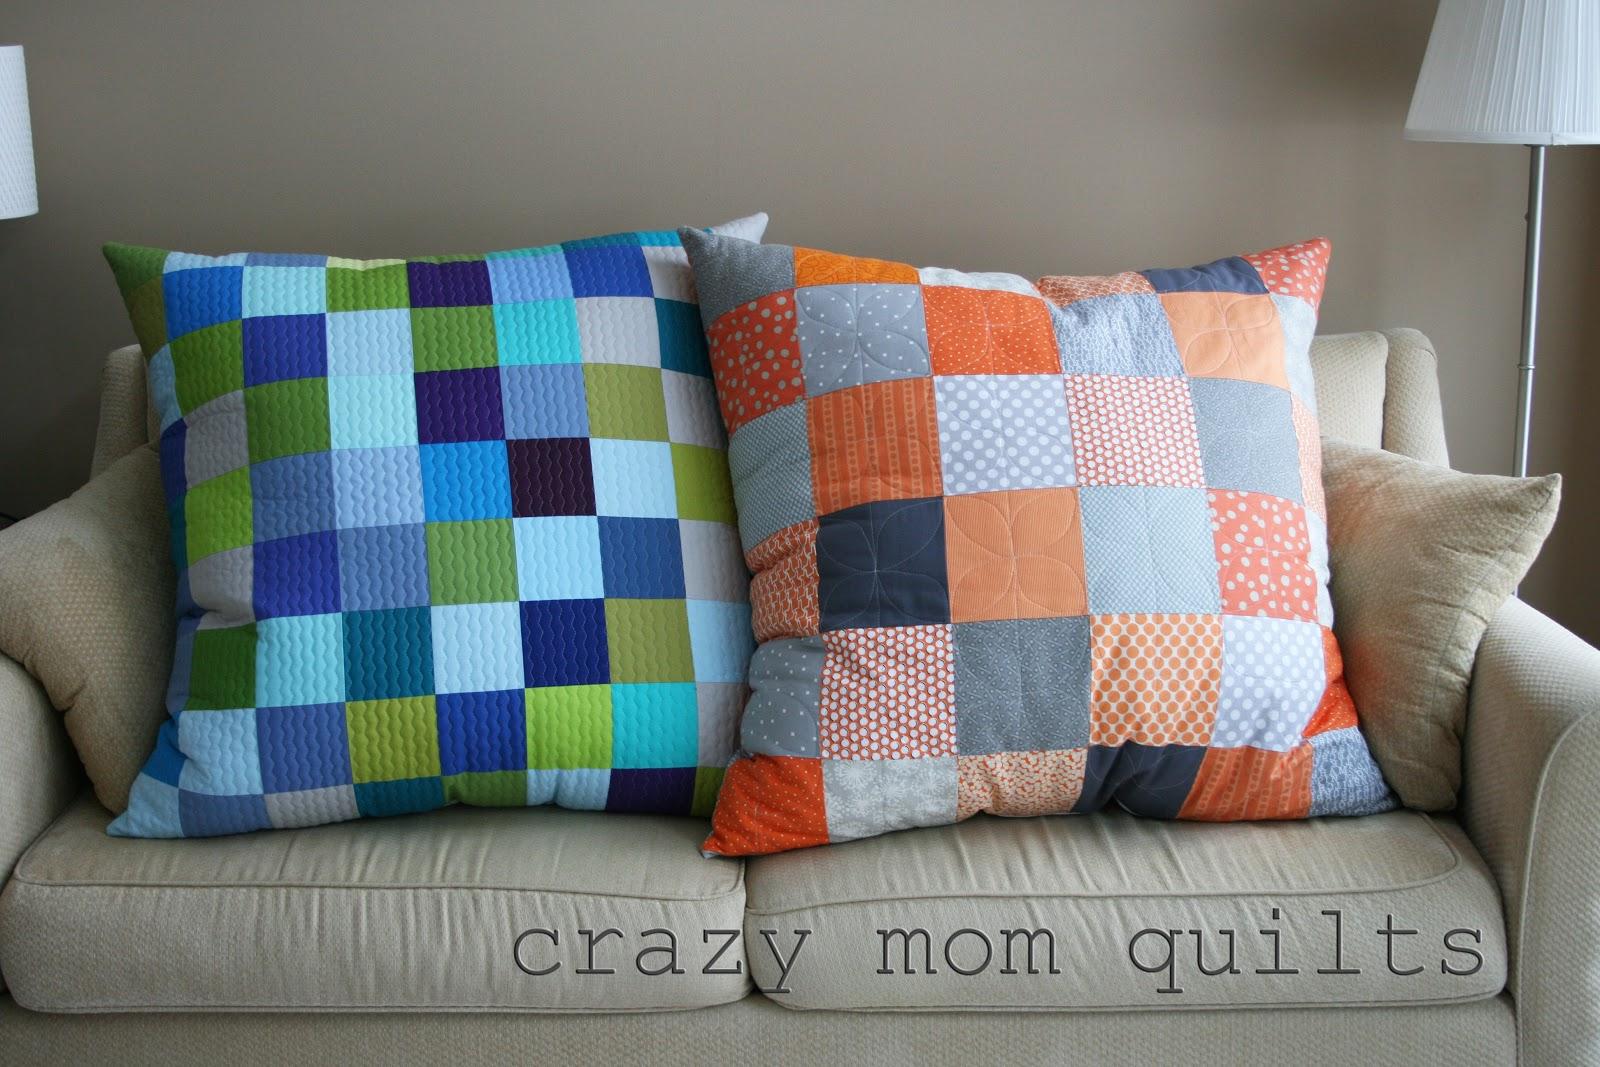 crazy mom quilts giant pillow redux. Black Bedroom Furniture Sets. Home Design Ideas